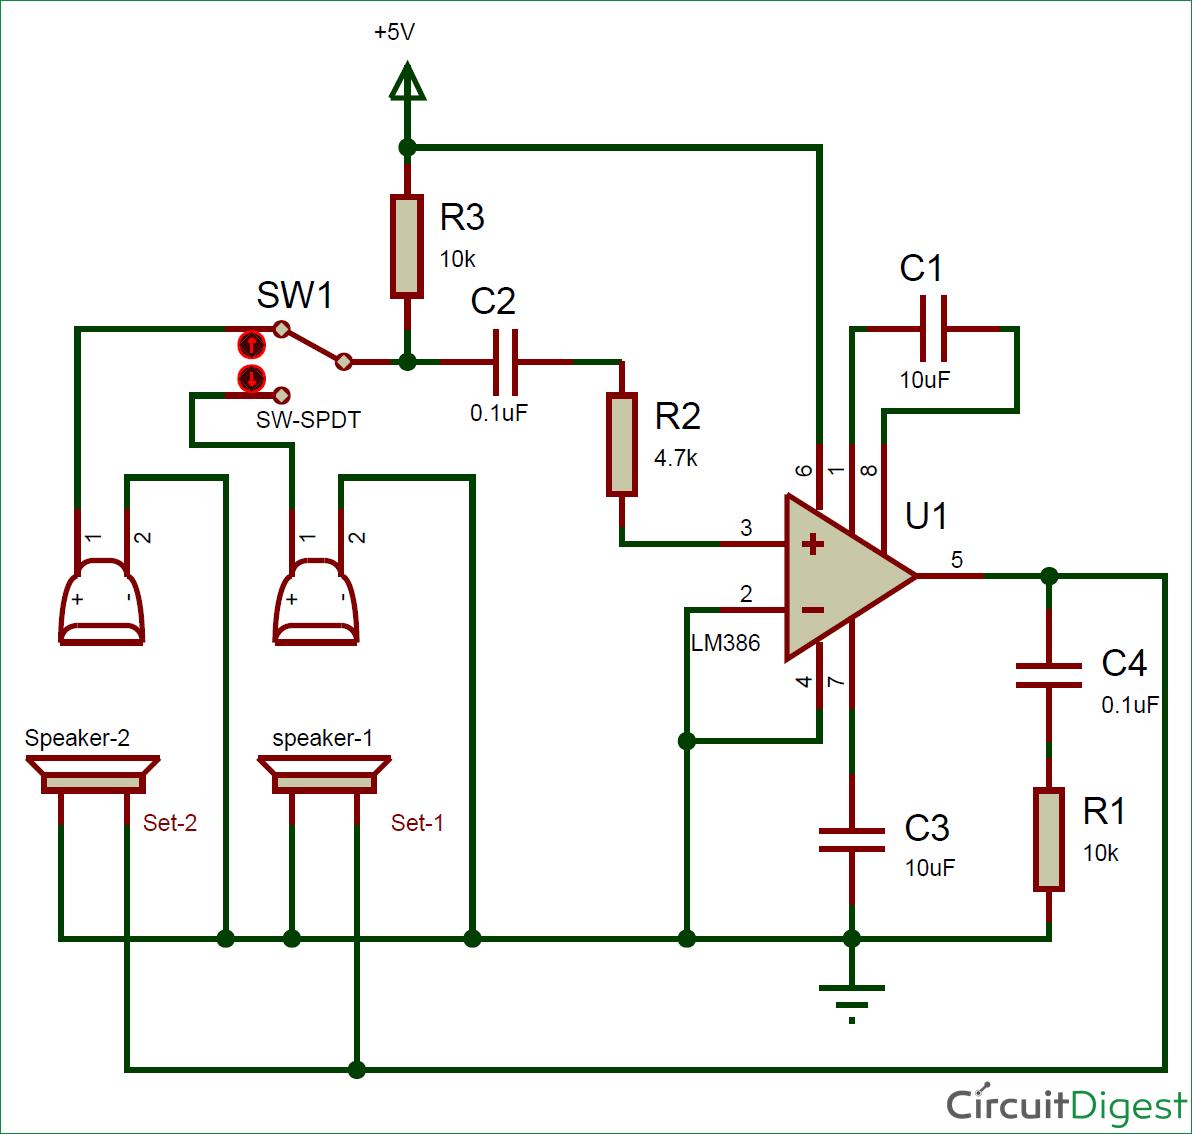 led light circuit diagram for dummies emc data trigon wiring all kn igesetze de u2022 residential electrical diagrams